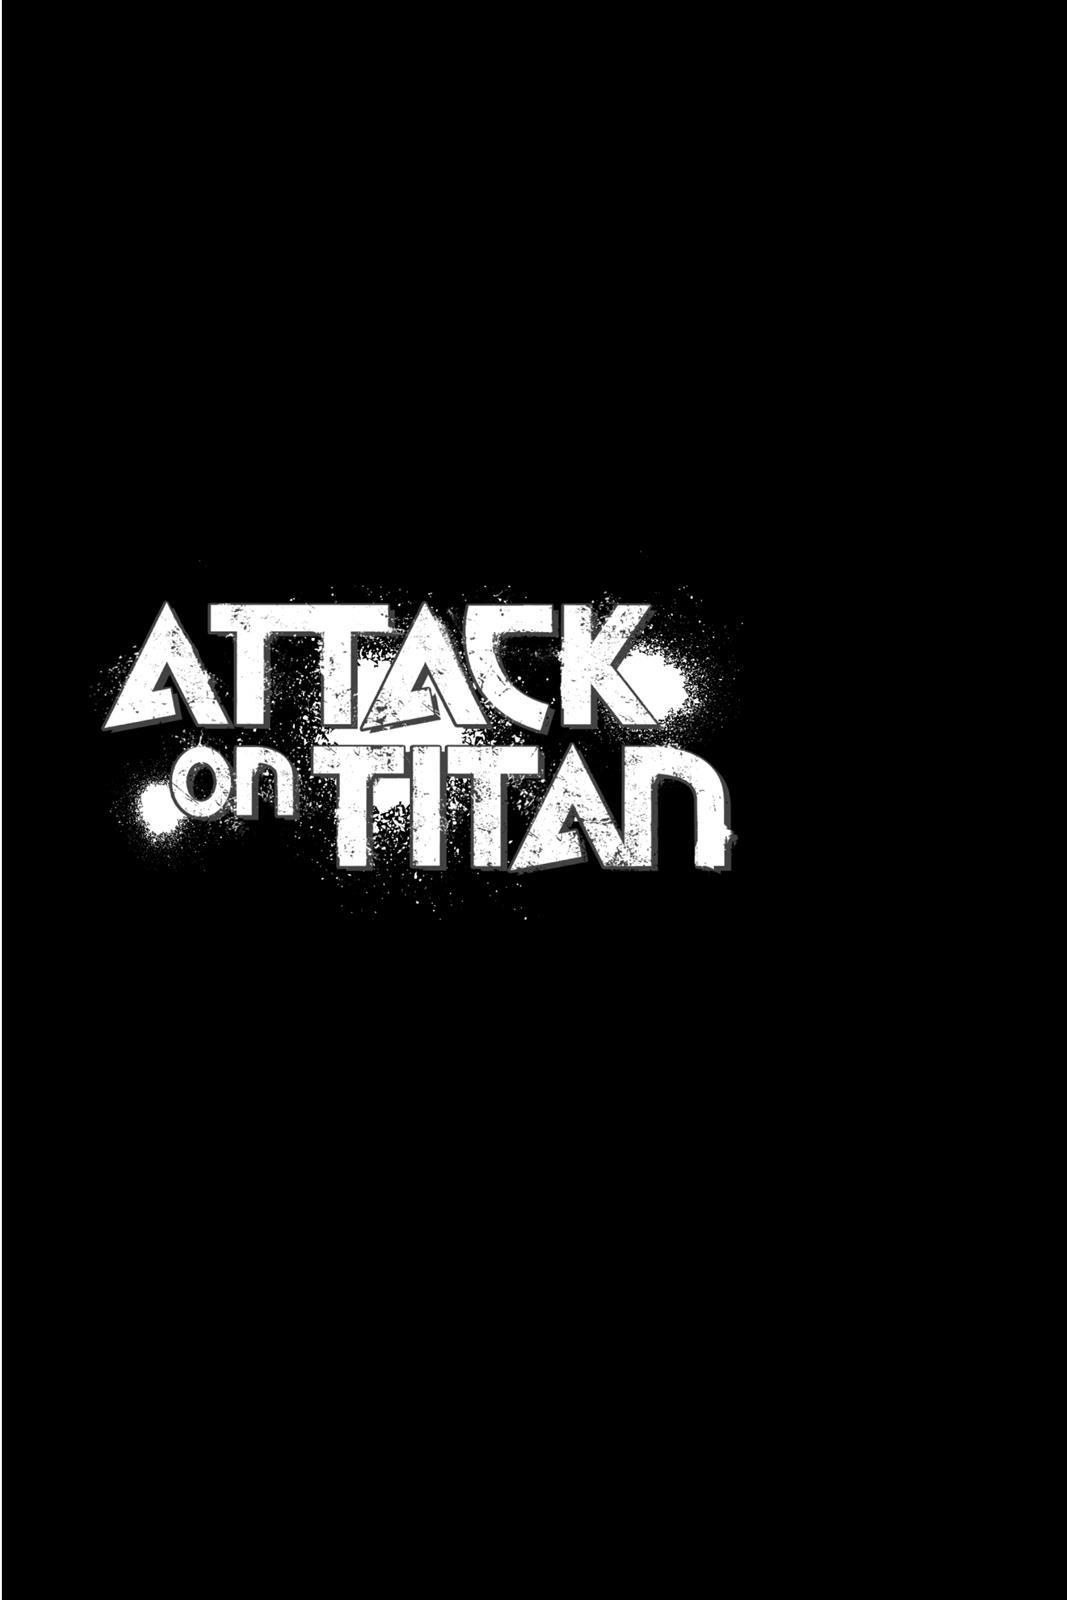 Attack On Titan, Episode 117 image 046